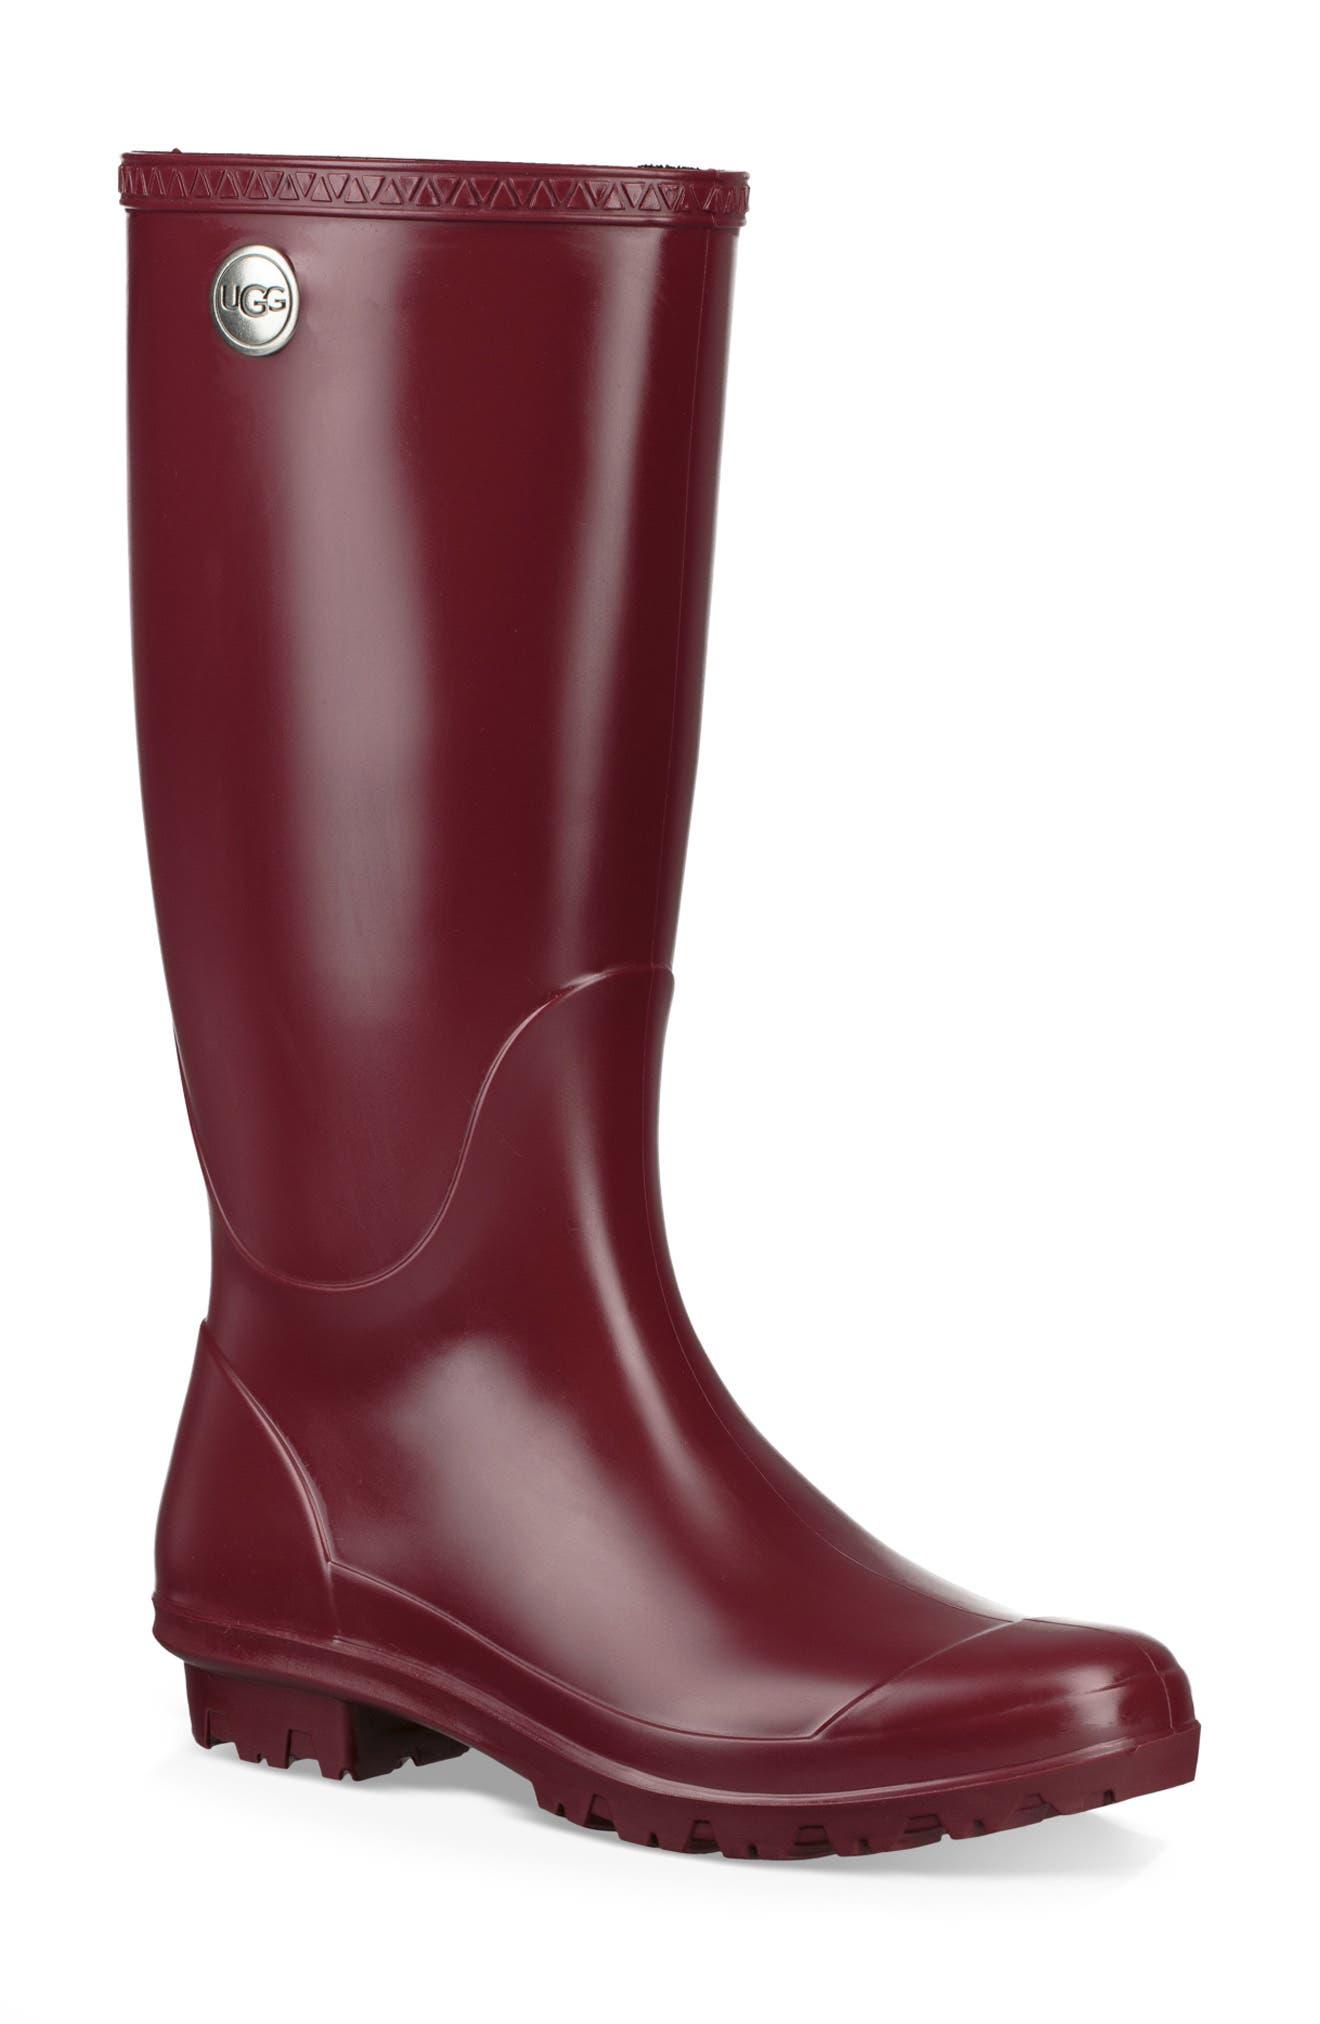 Shelby Matte Waterproof Rain Boot,                             Main thumbnail 1, color,                             GARNET RUBBER